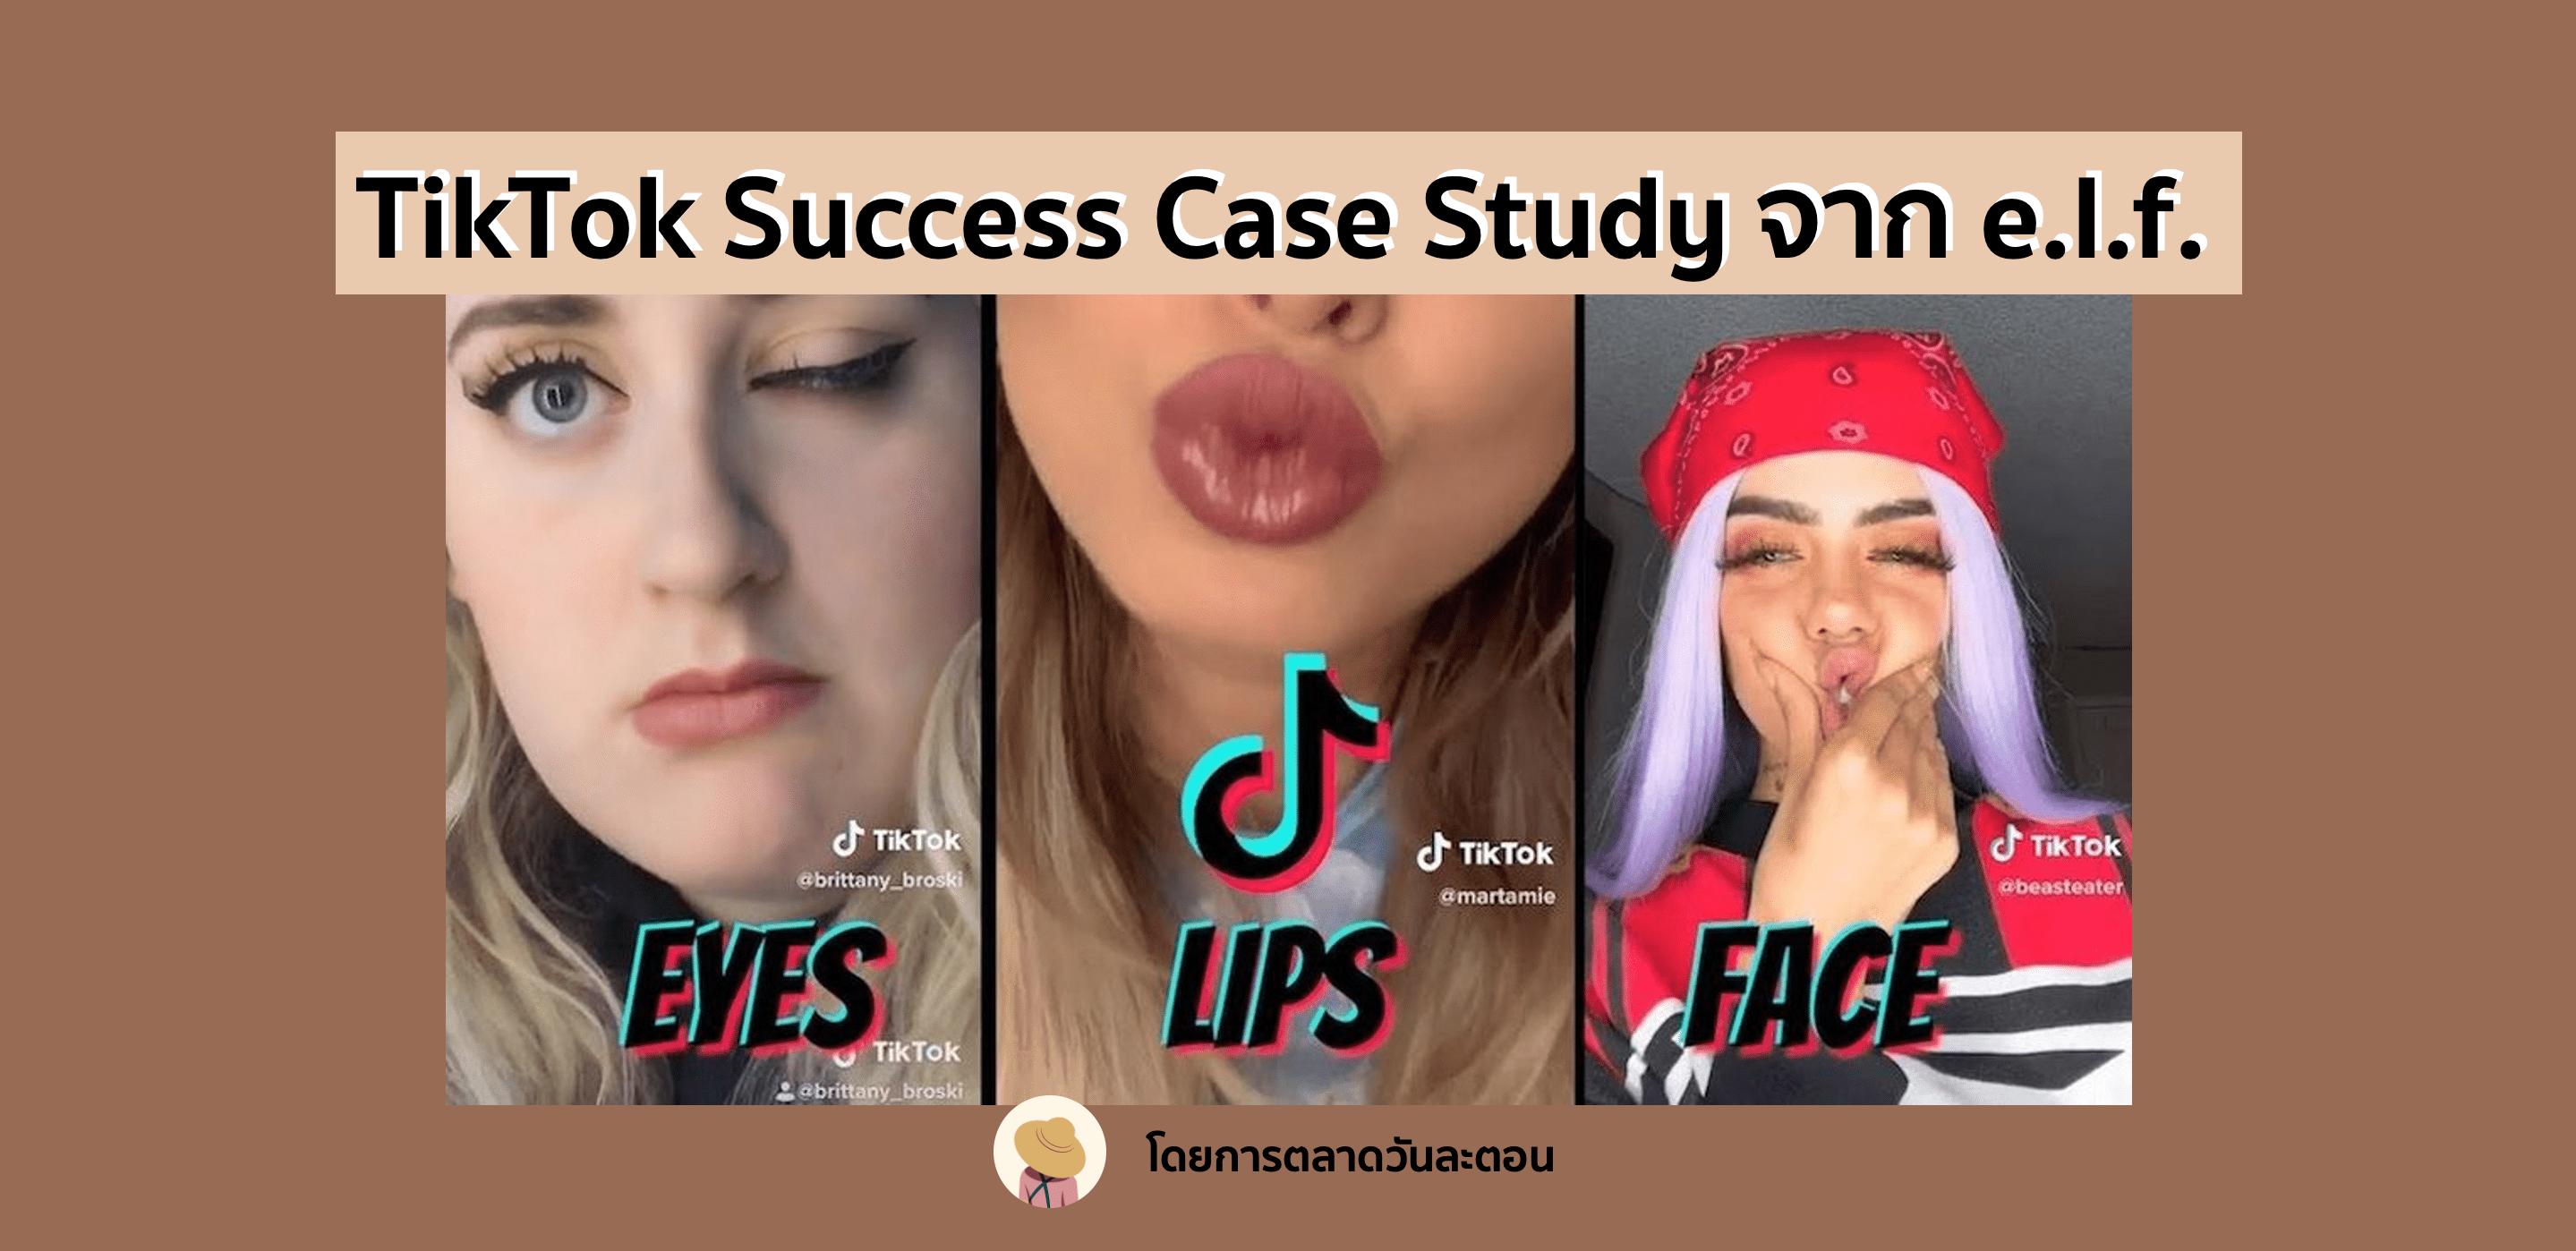 #EyesLipsFace – TikTok Success Case Study จาก e.l.f.